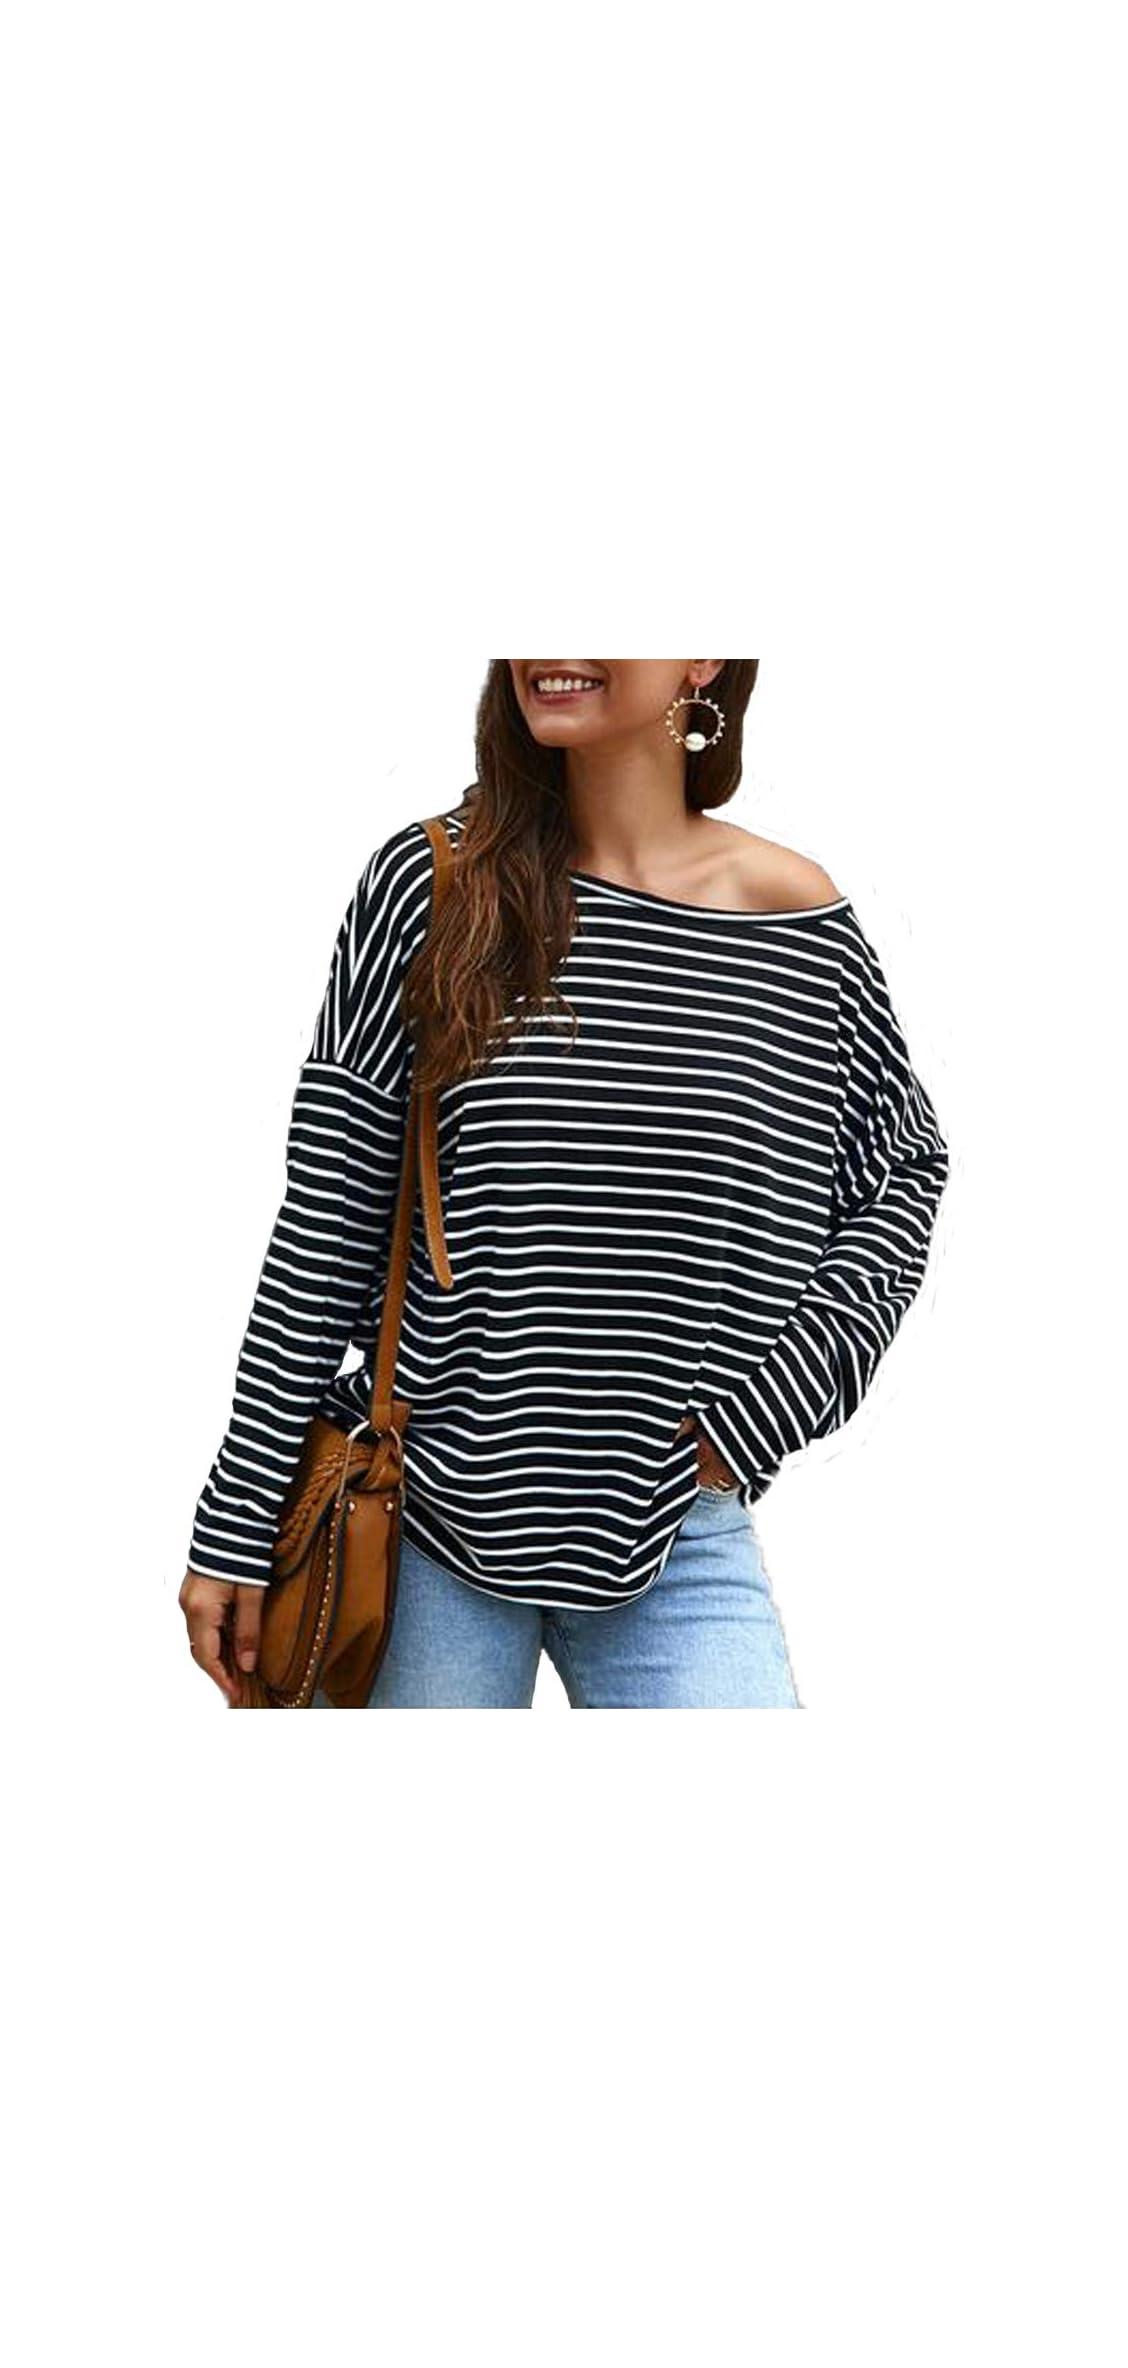 Women's Off Shoulder Long Sleeve Boat Neck Striped Shirts